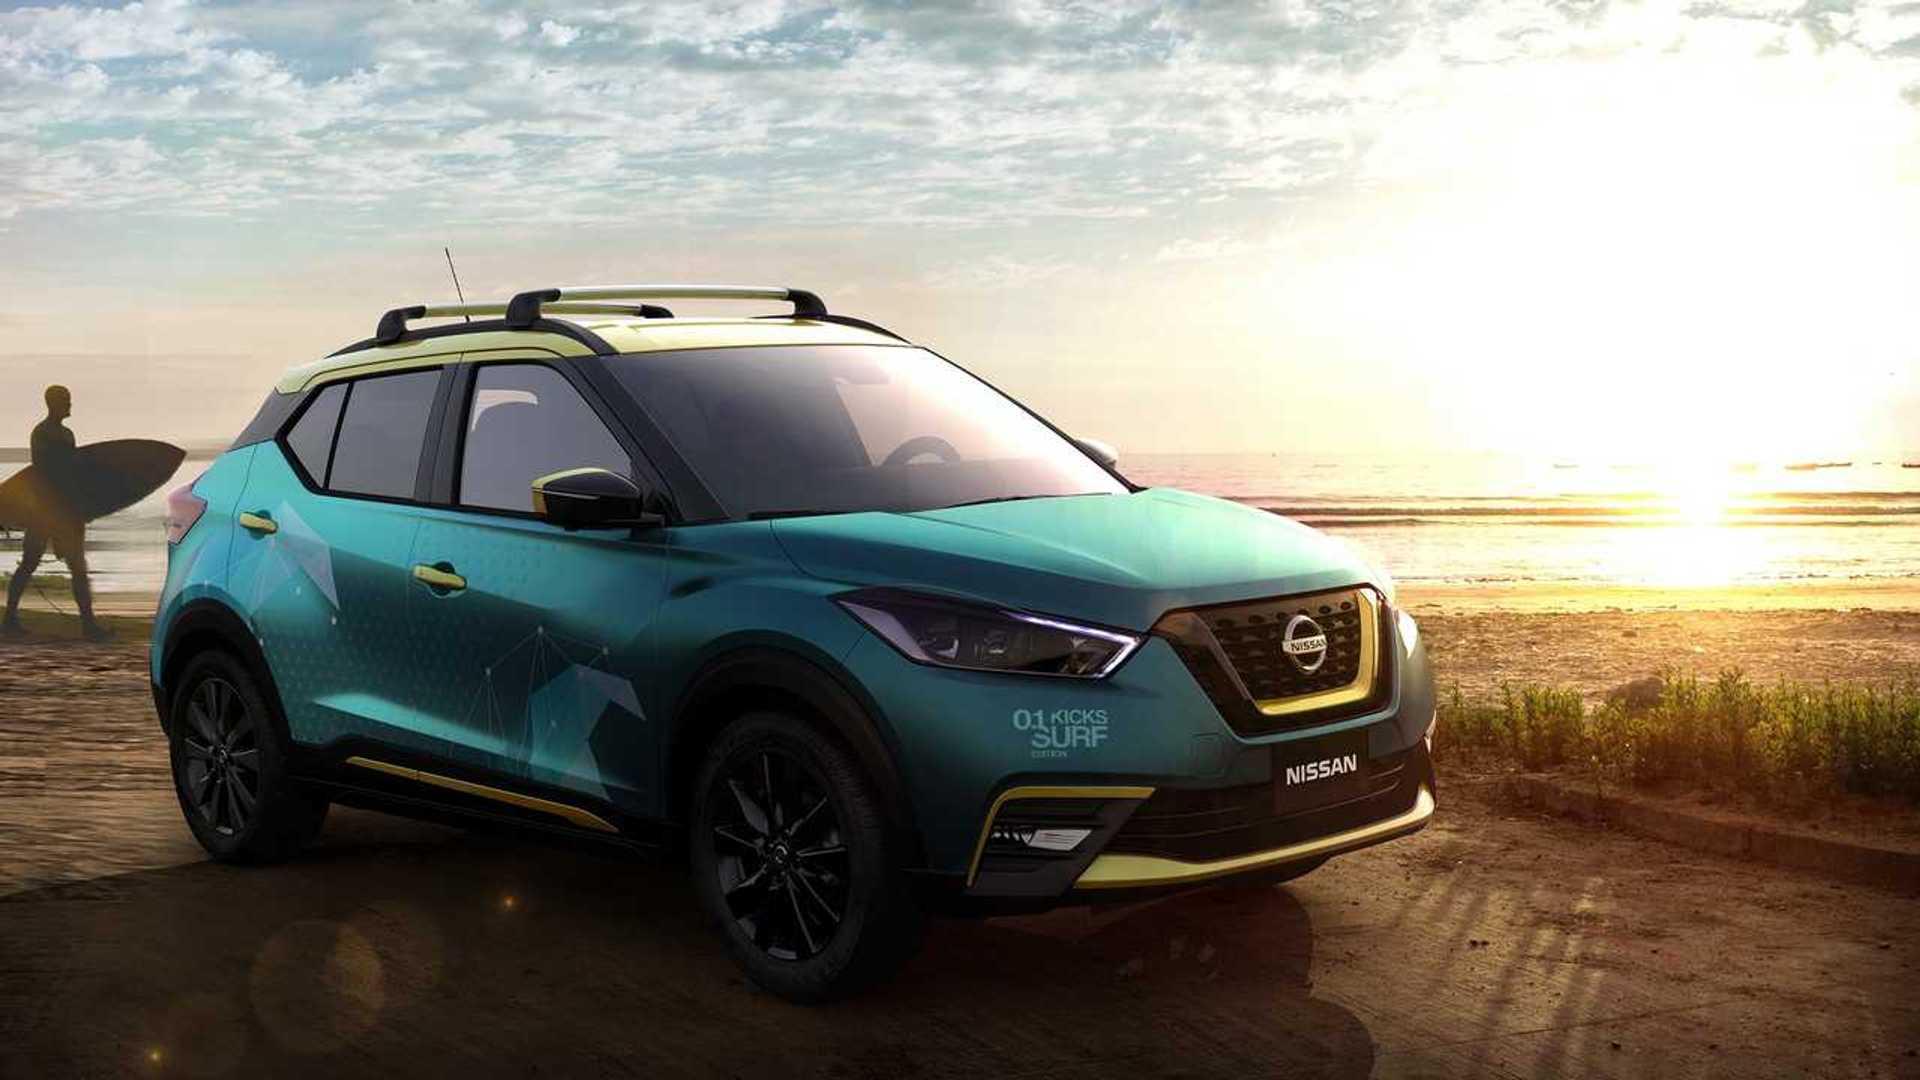 2017 - [Nissan] Kicks - Page 3 Nissan-kicks-surf-concept